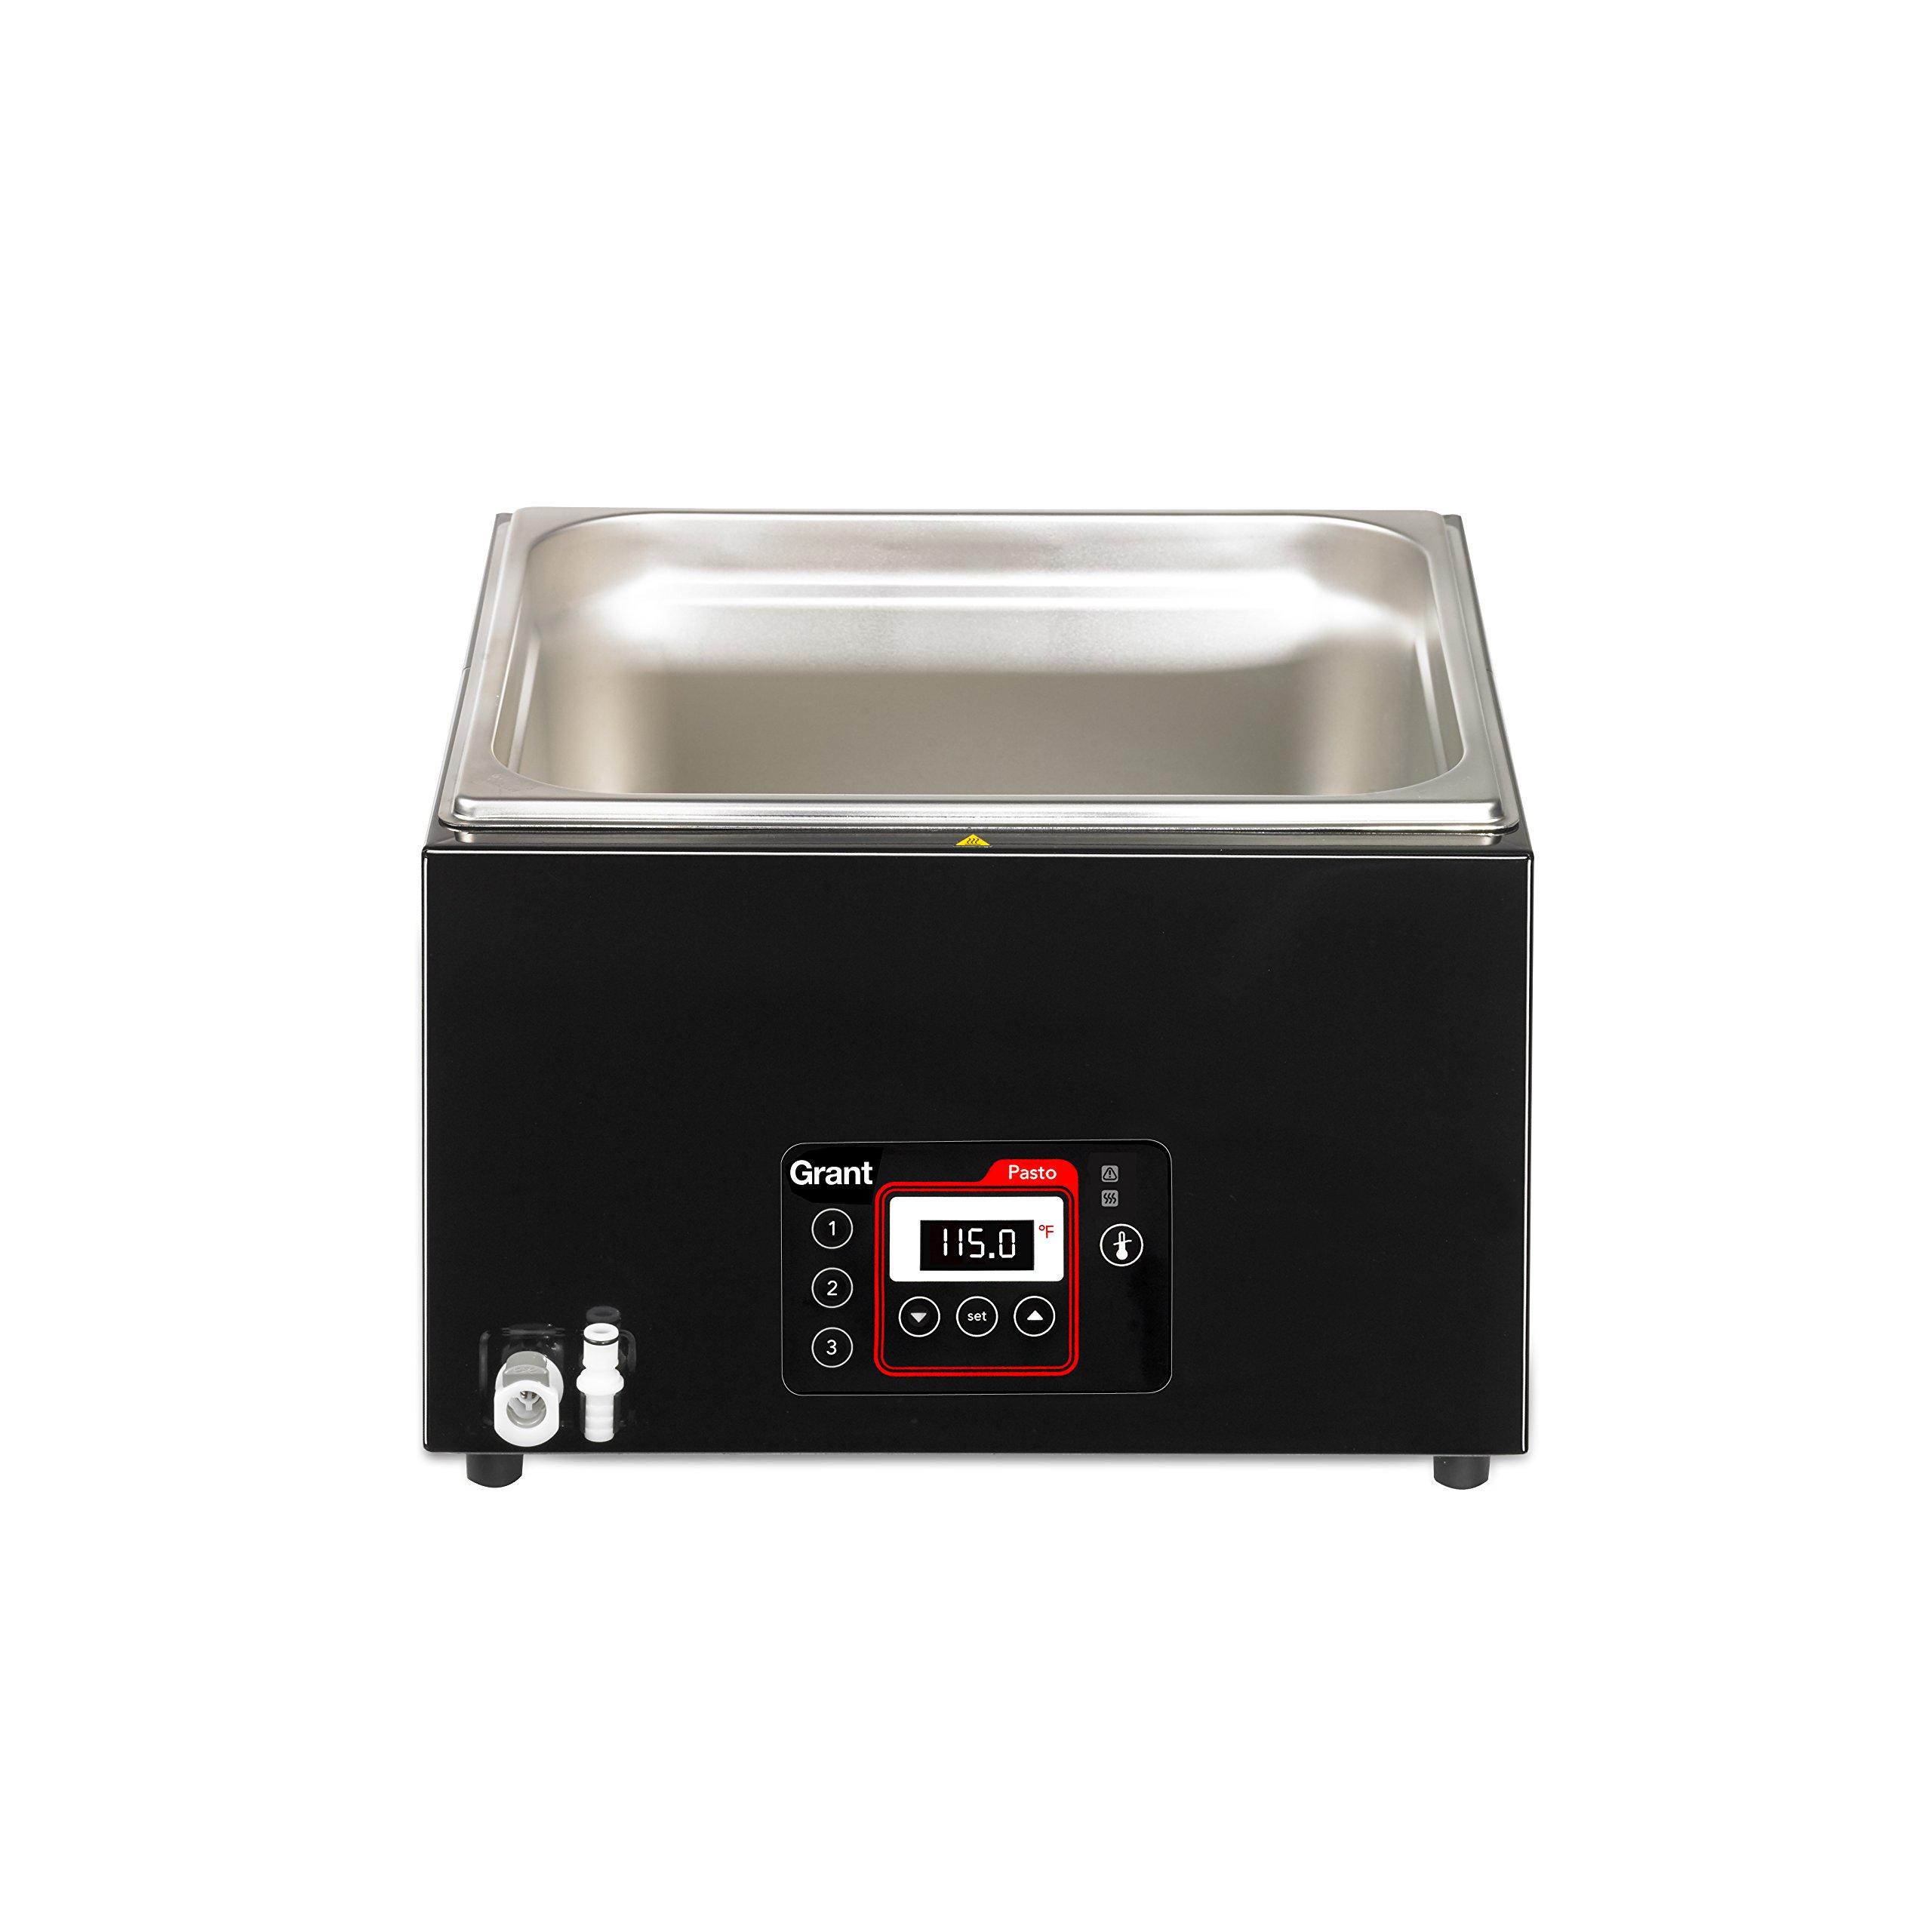 Creative Cuisine By Grant Professional Pasto Sous Vide Water Bath, Black, 26L